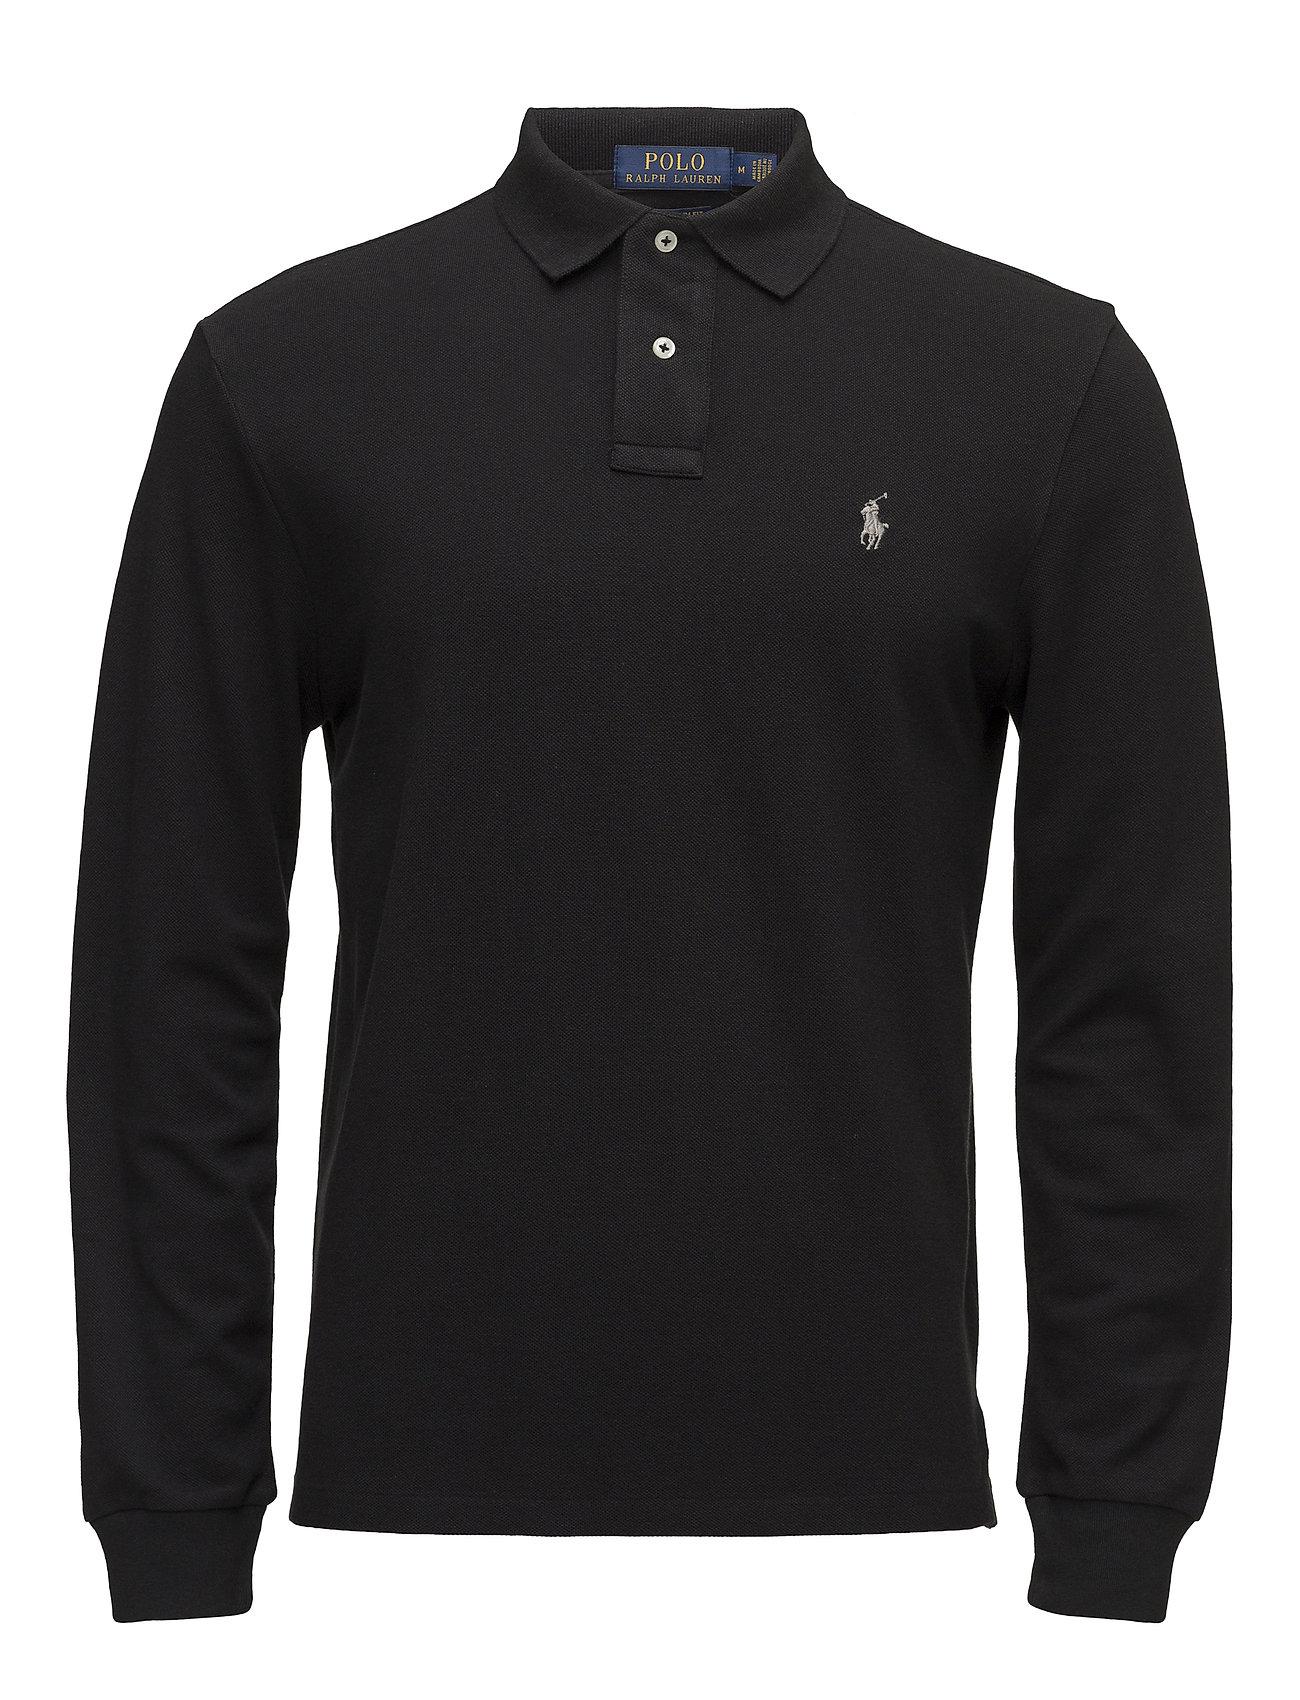 487e983da35a Classic Fit Long-sleeve Polo (Polo Black) (£90) - Polo Ralph Lauren ...